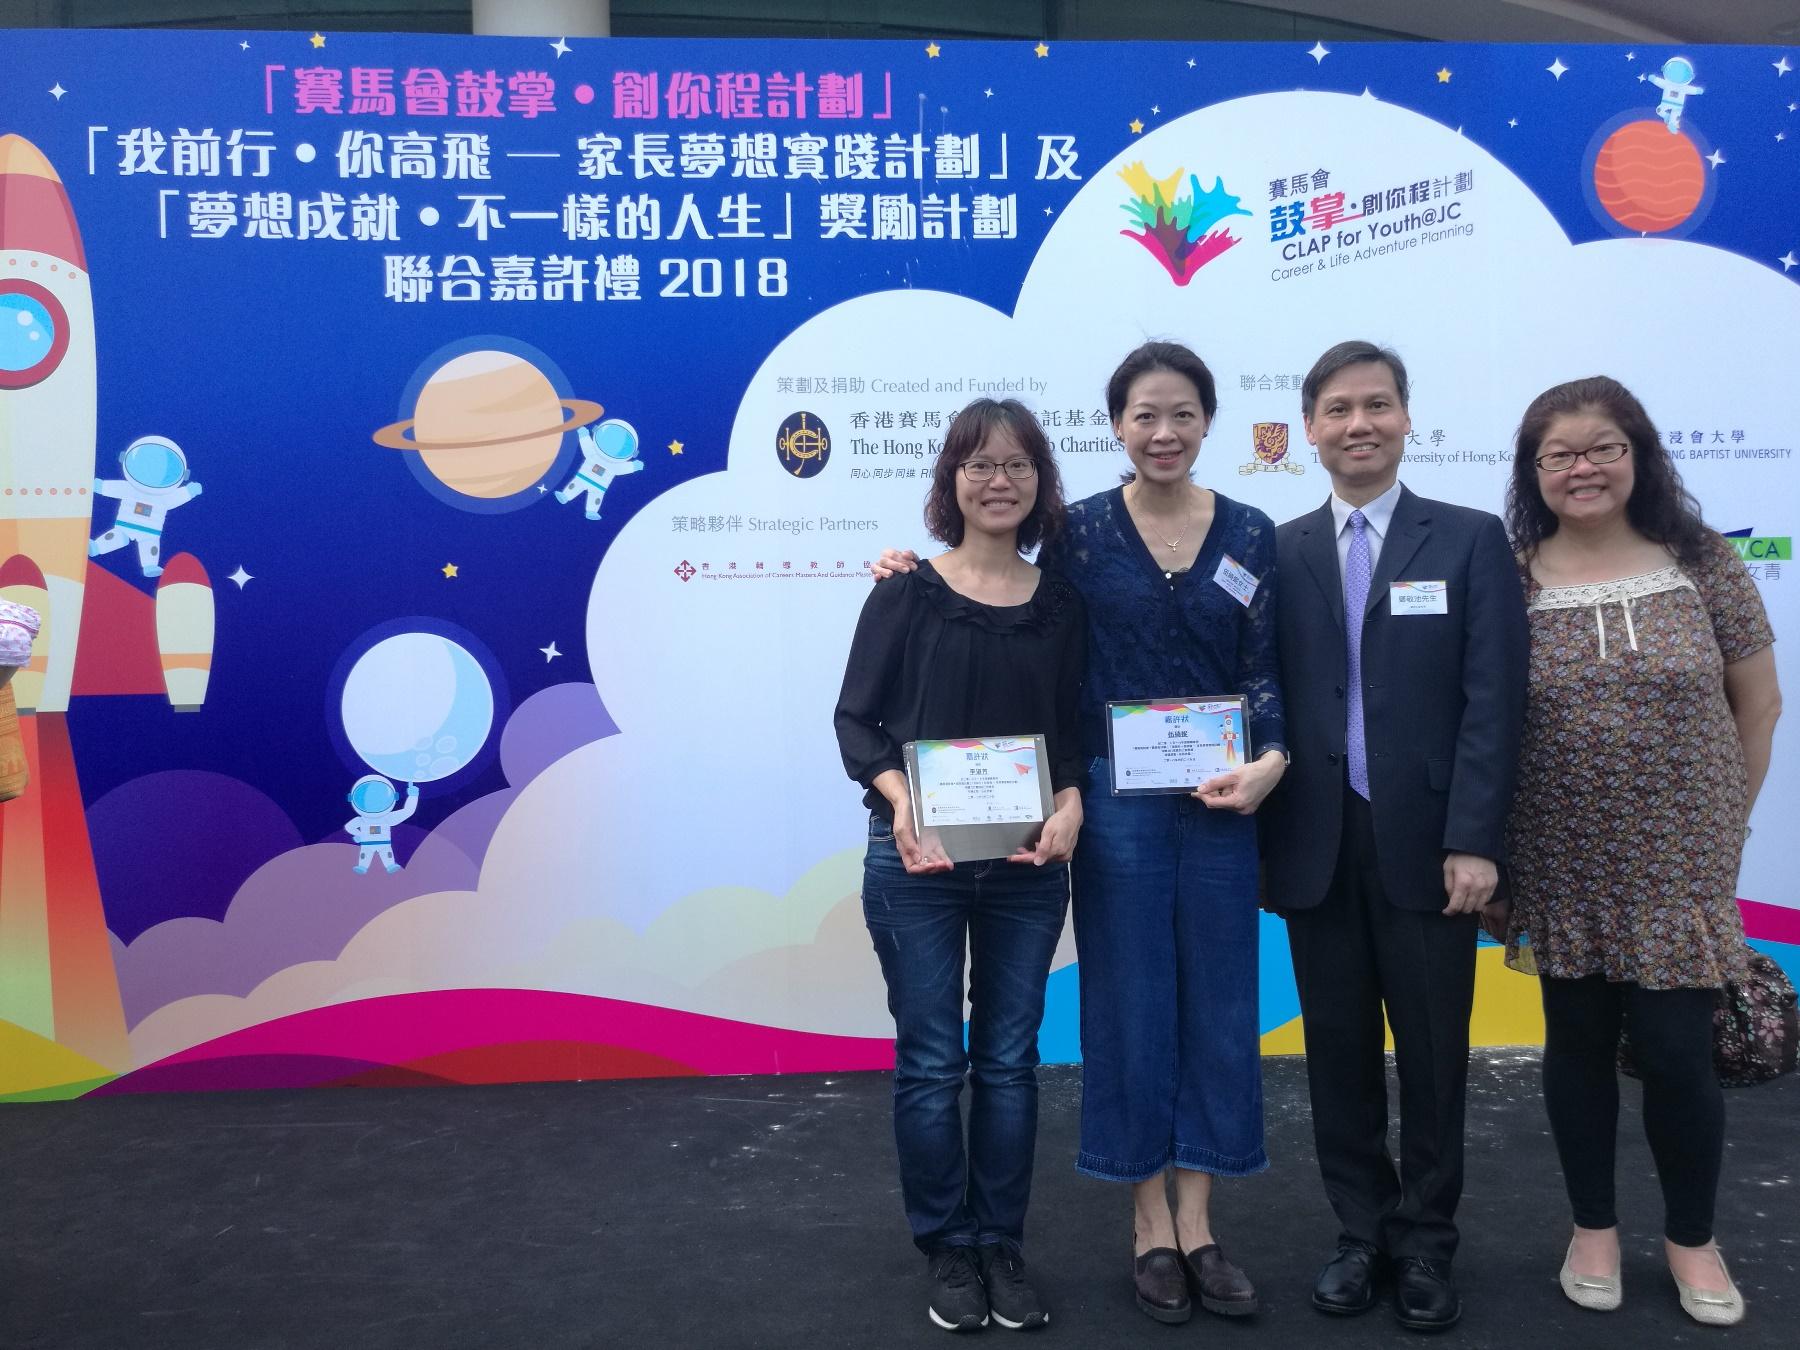 https://www.npc.edu.hk/sites/default/files/img_20180429_164659.jpg